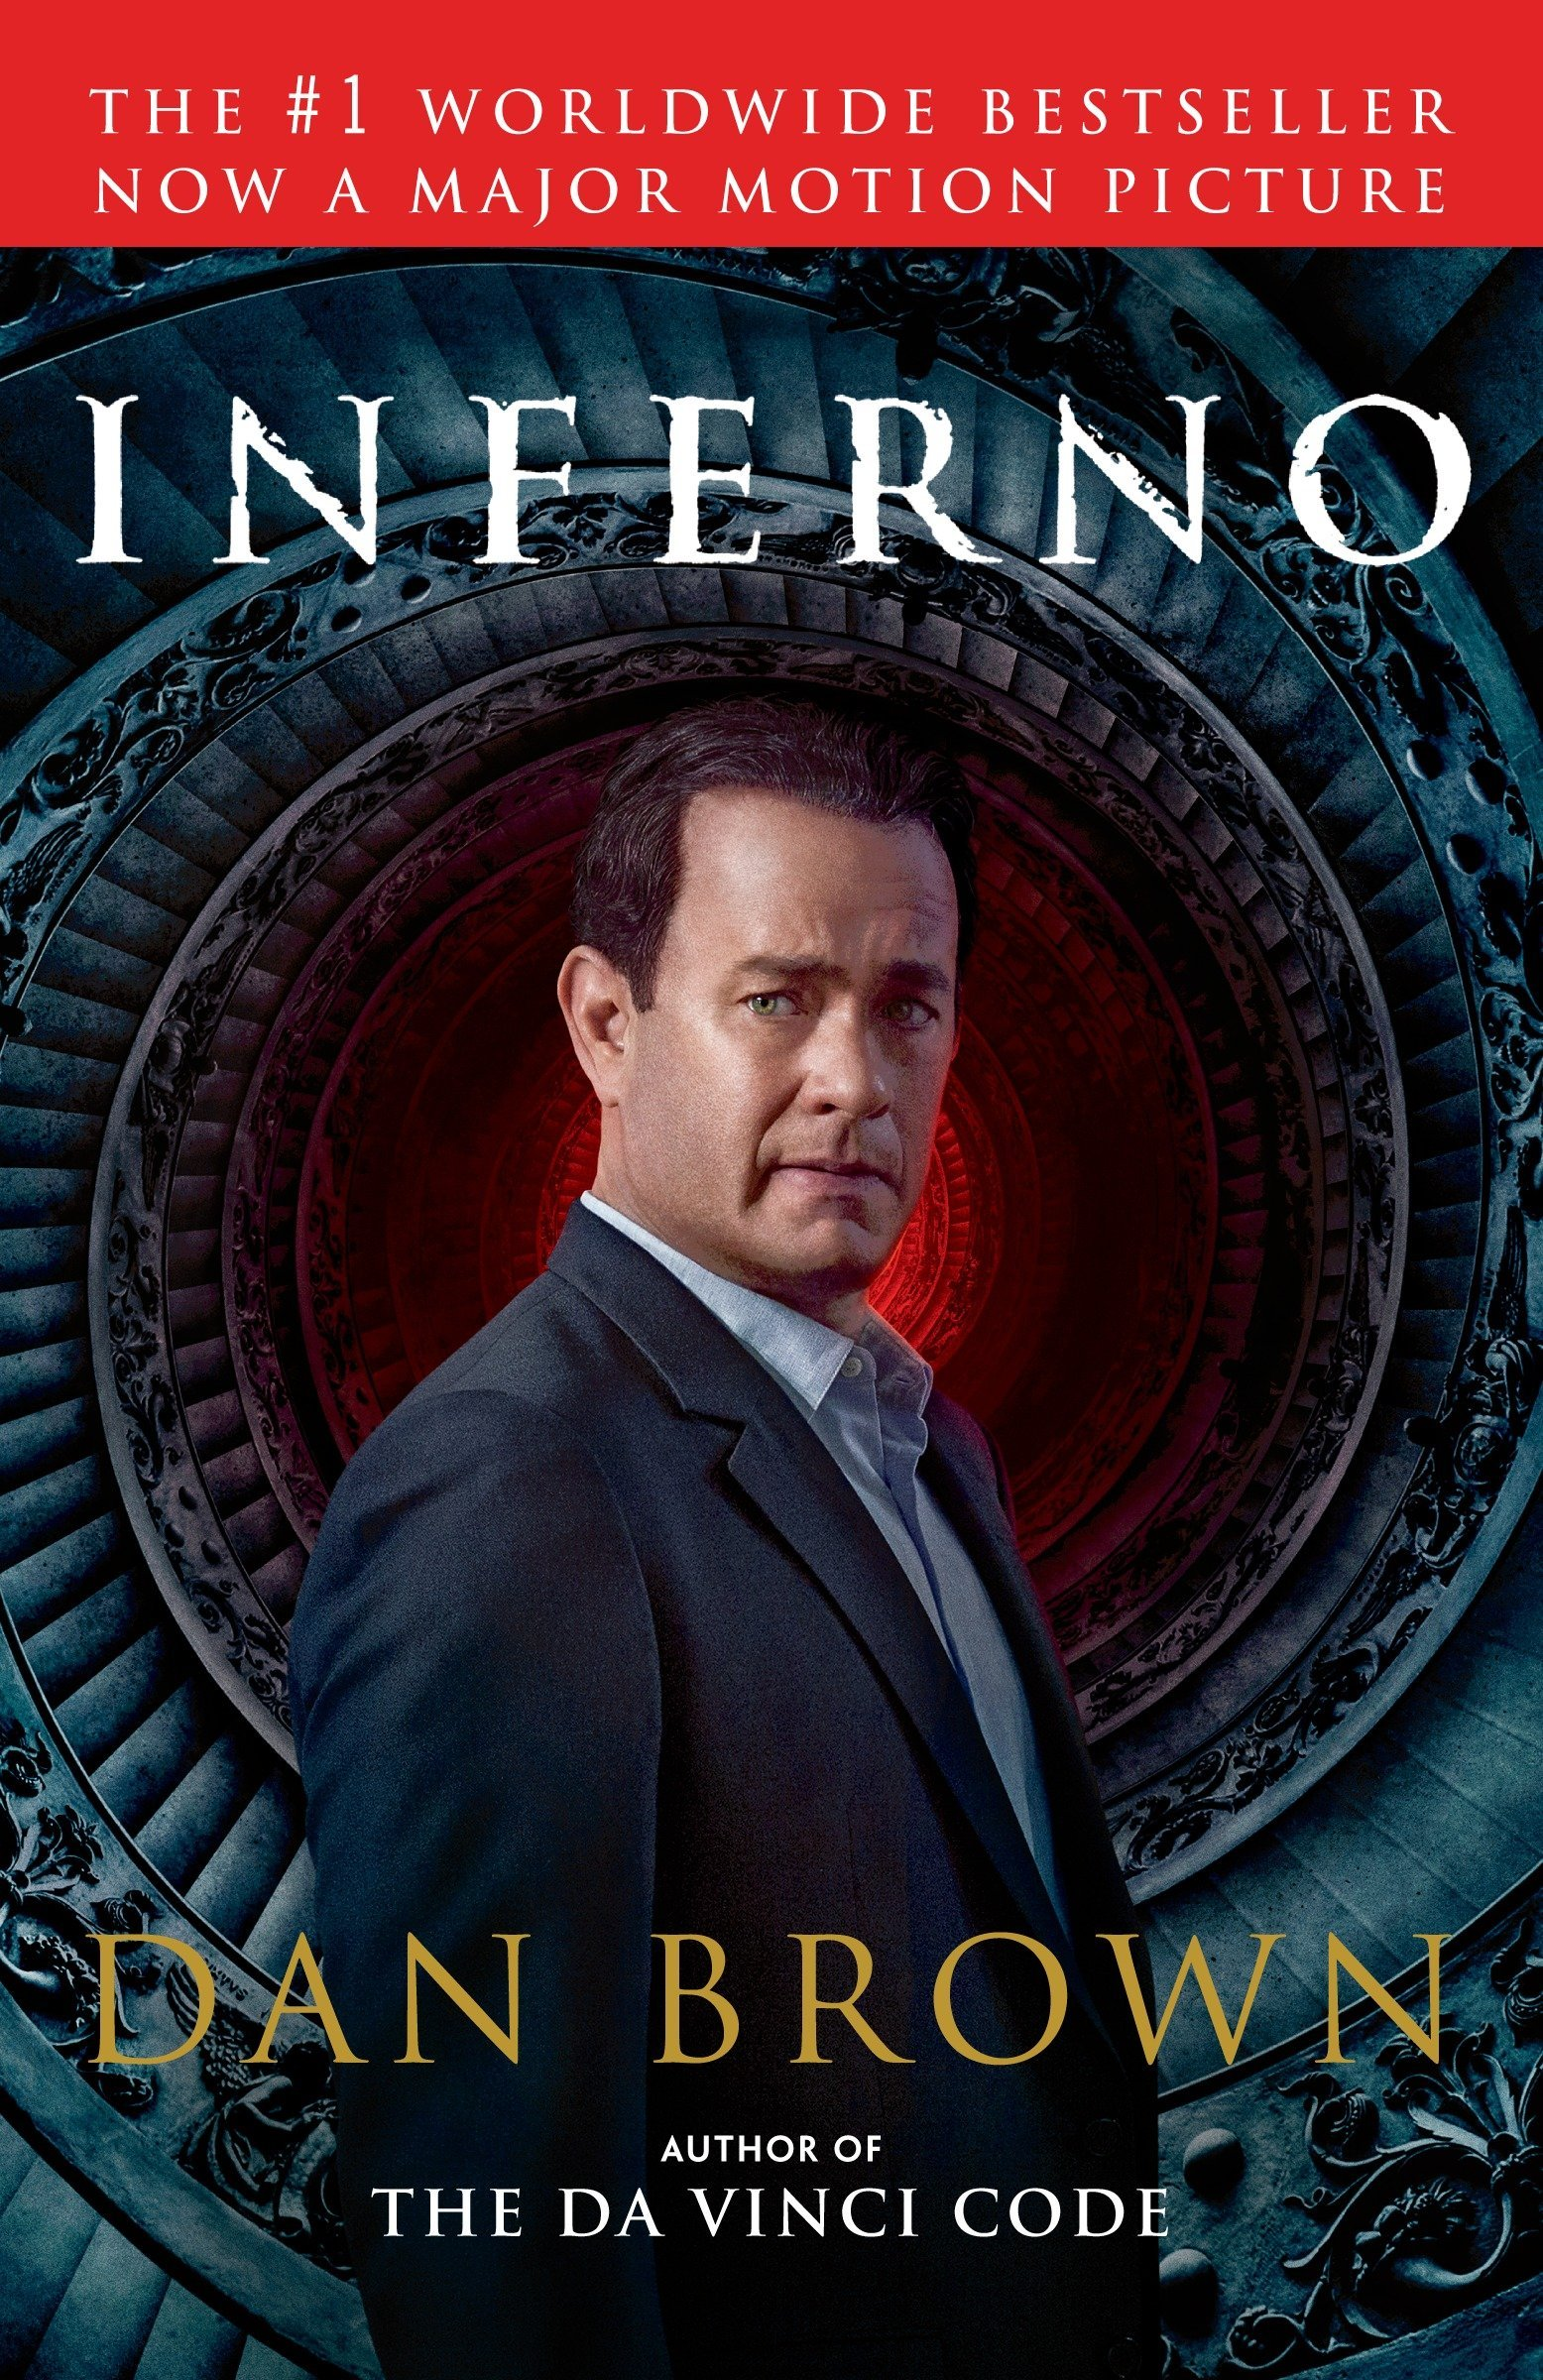 Inferno (Movie Tie-in Edition) (Robert Langdon) pdf epub